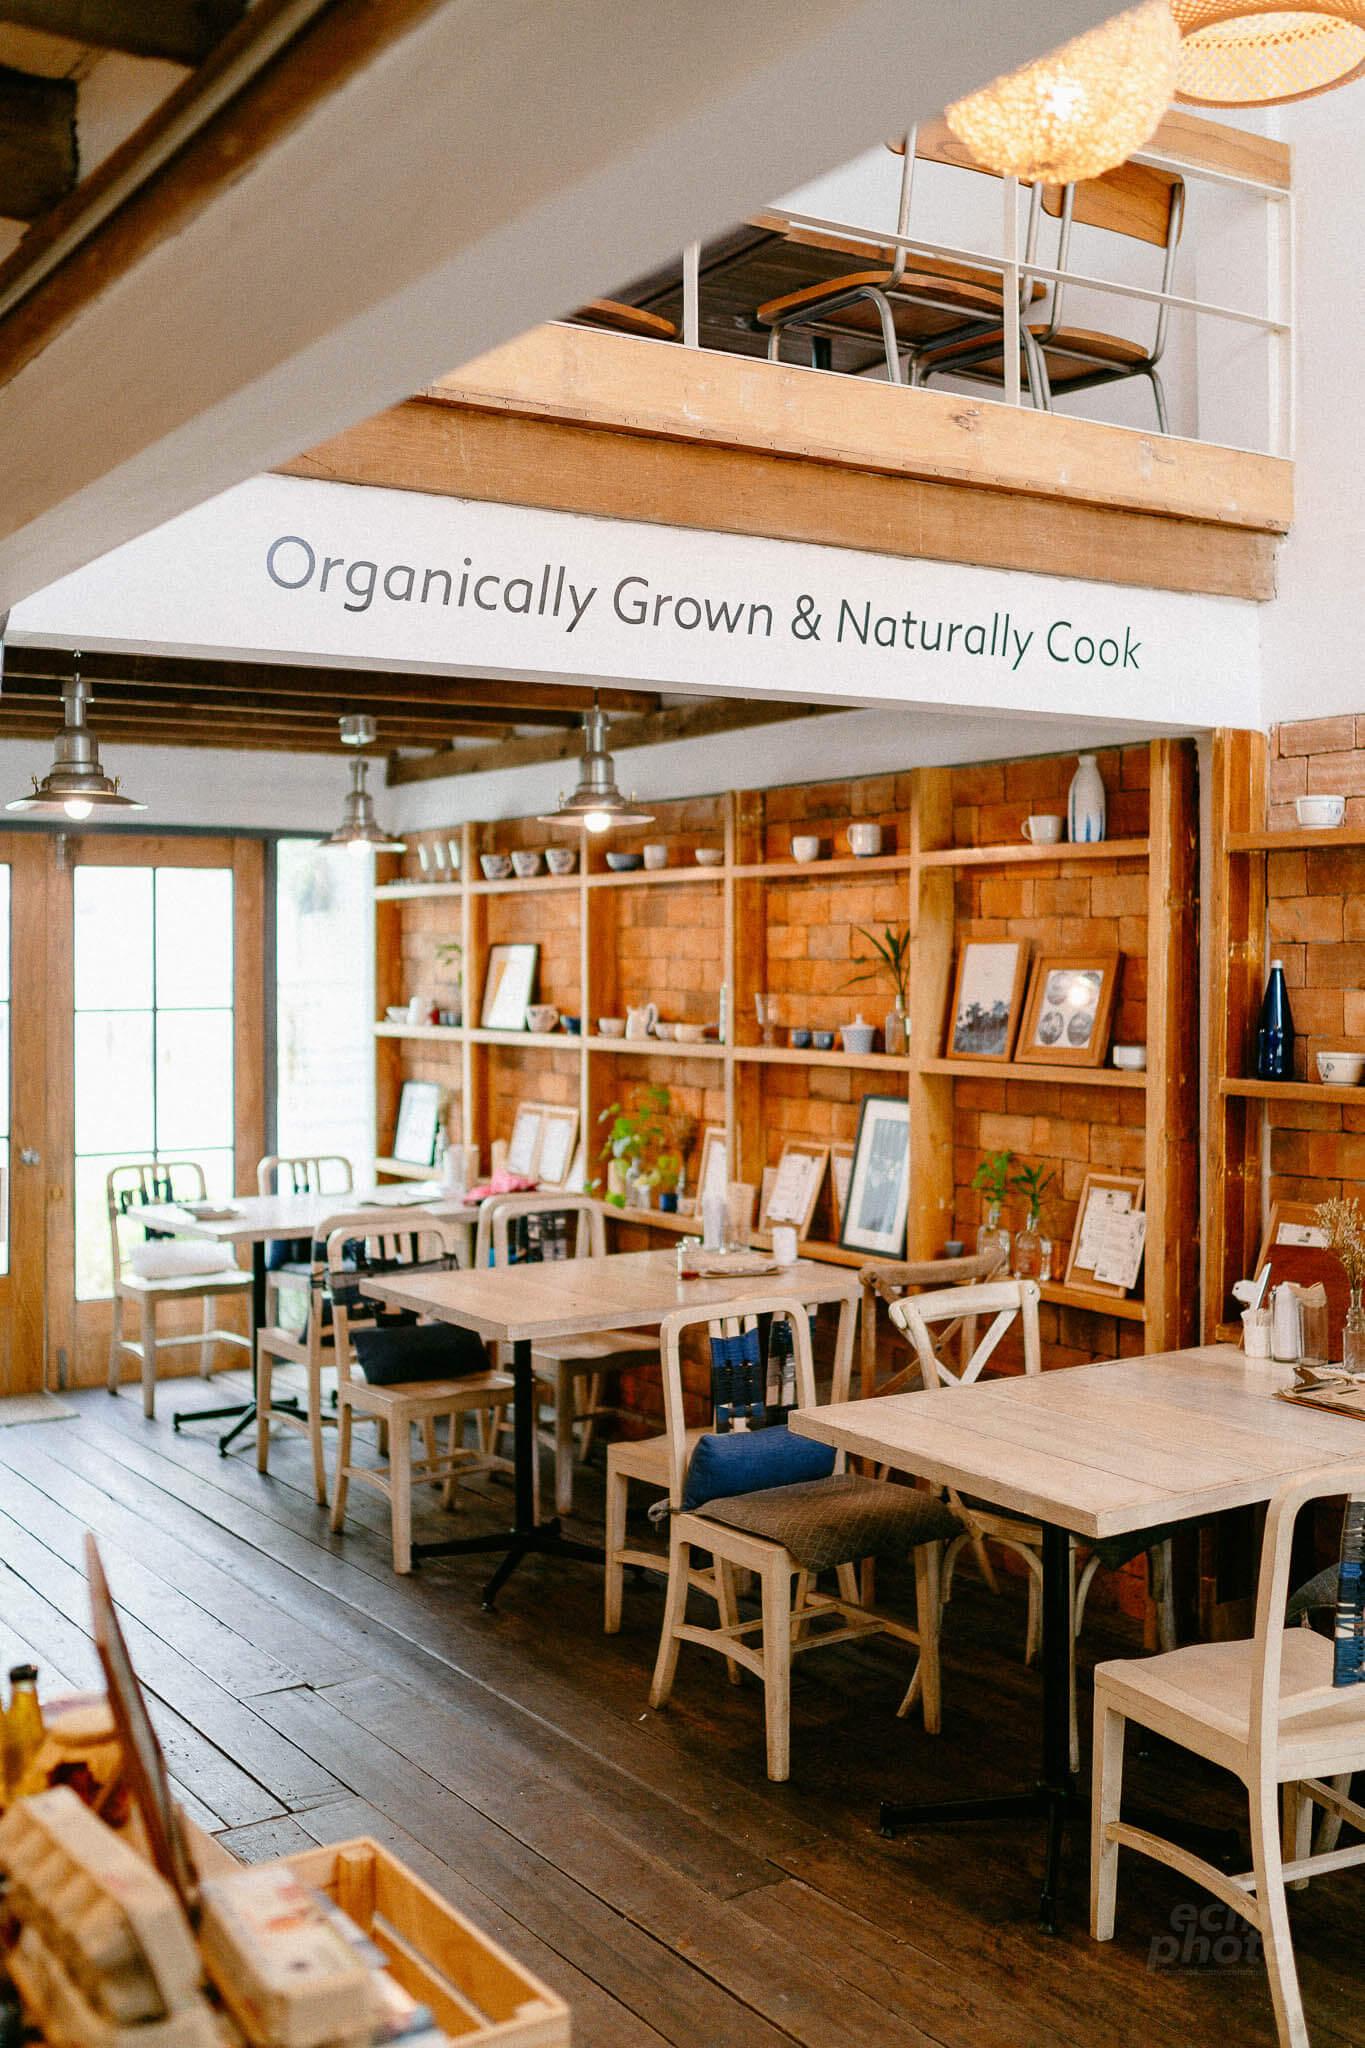 TAAN (ทาน) ORGANIC CAFE คุณทานอิ่มแค่ไหนก็จ่ายตามต้องการ 23 - cafe